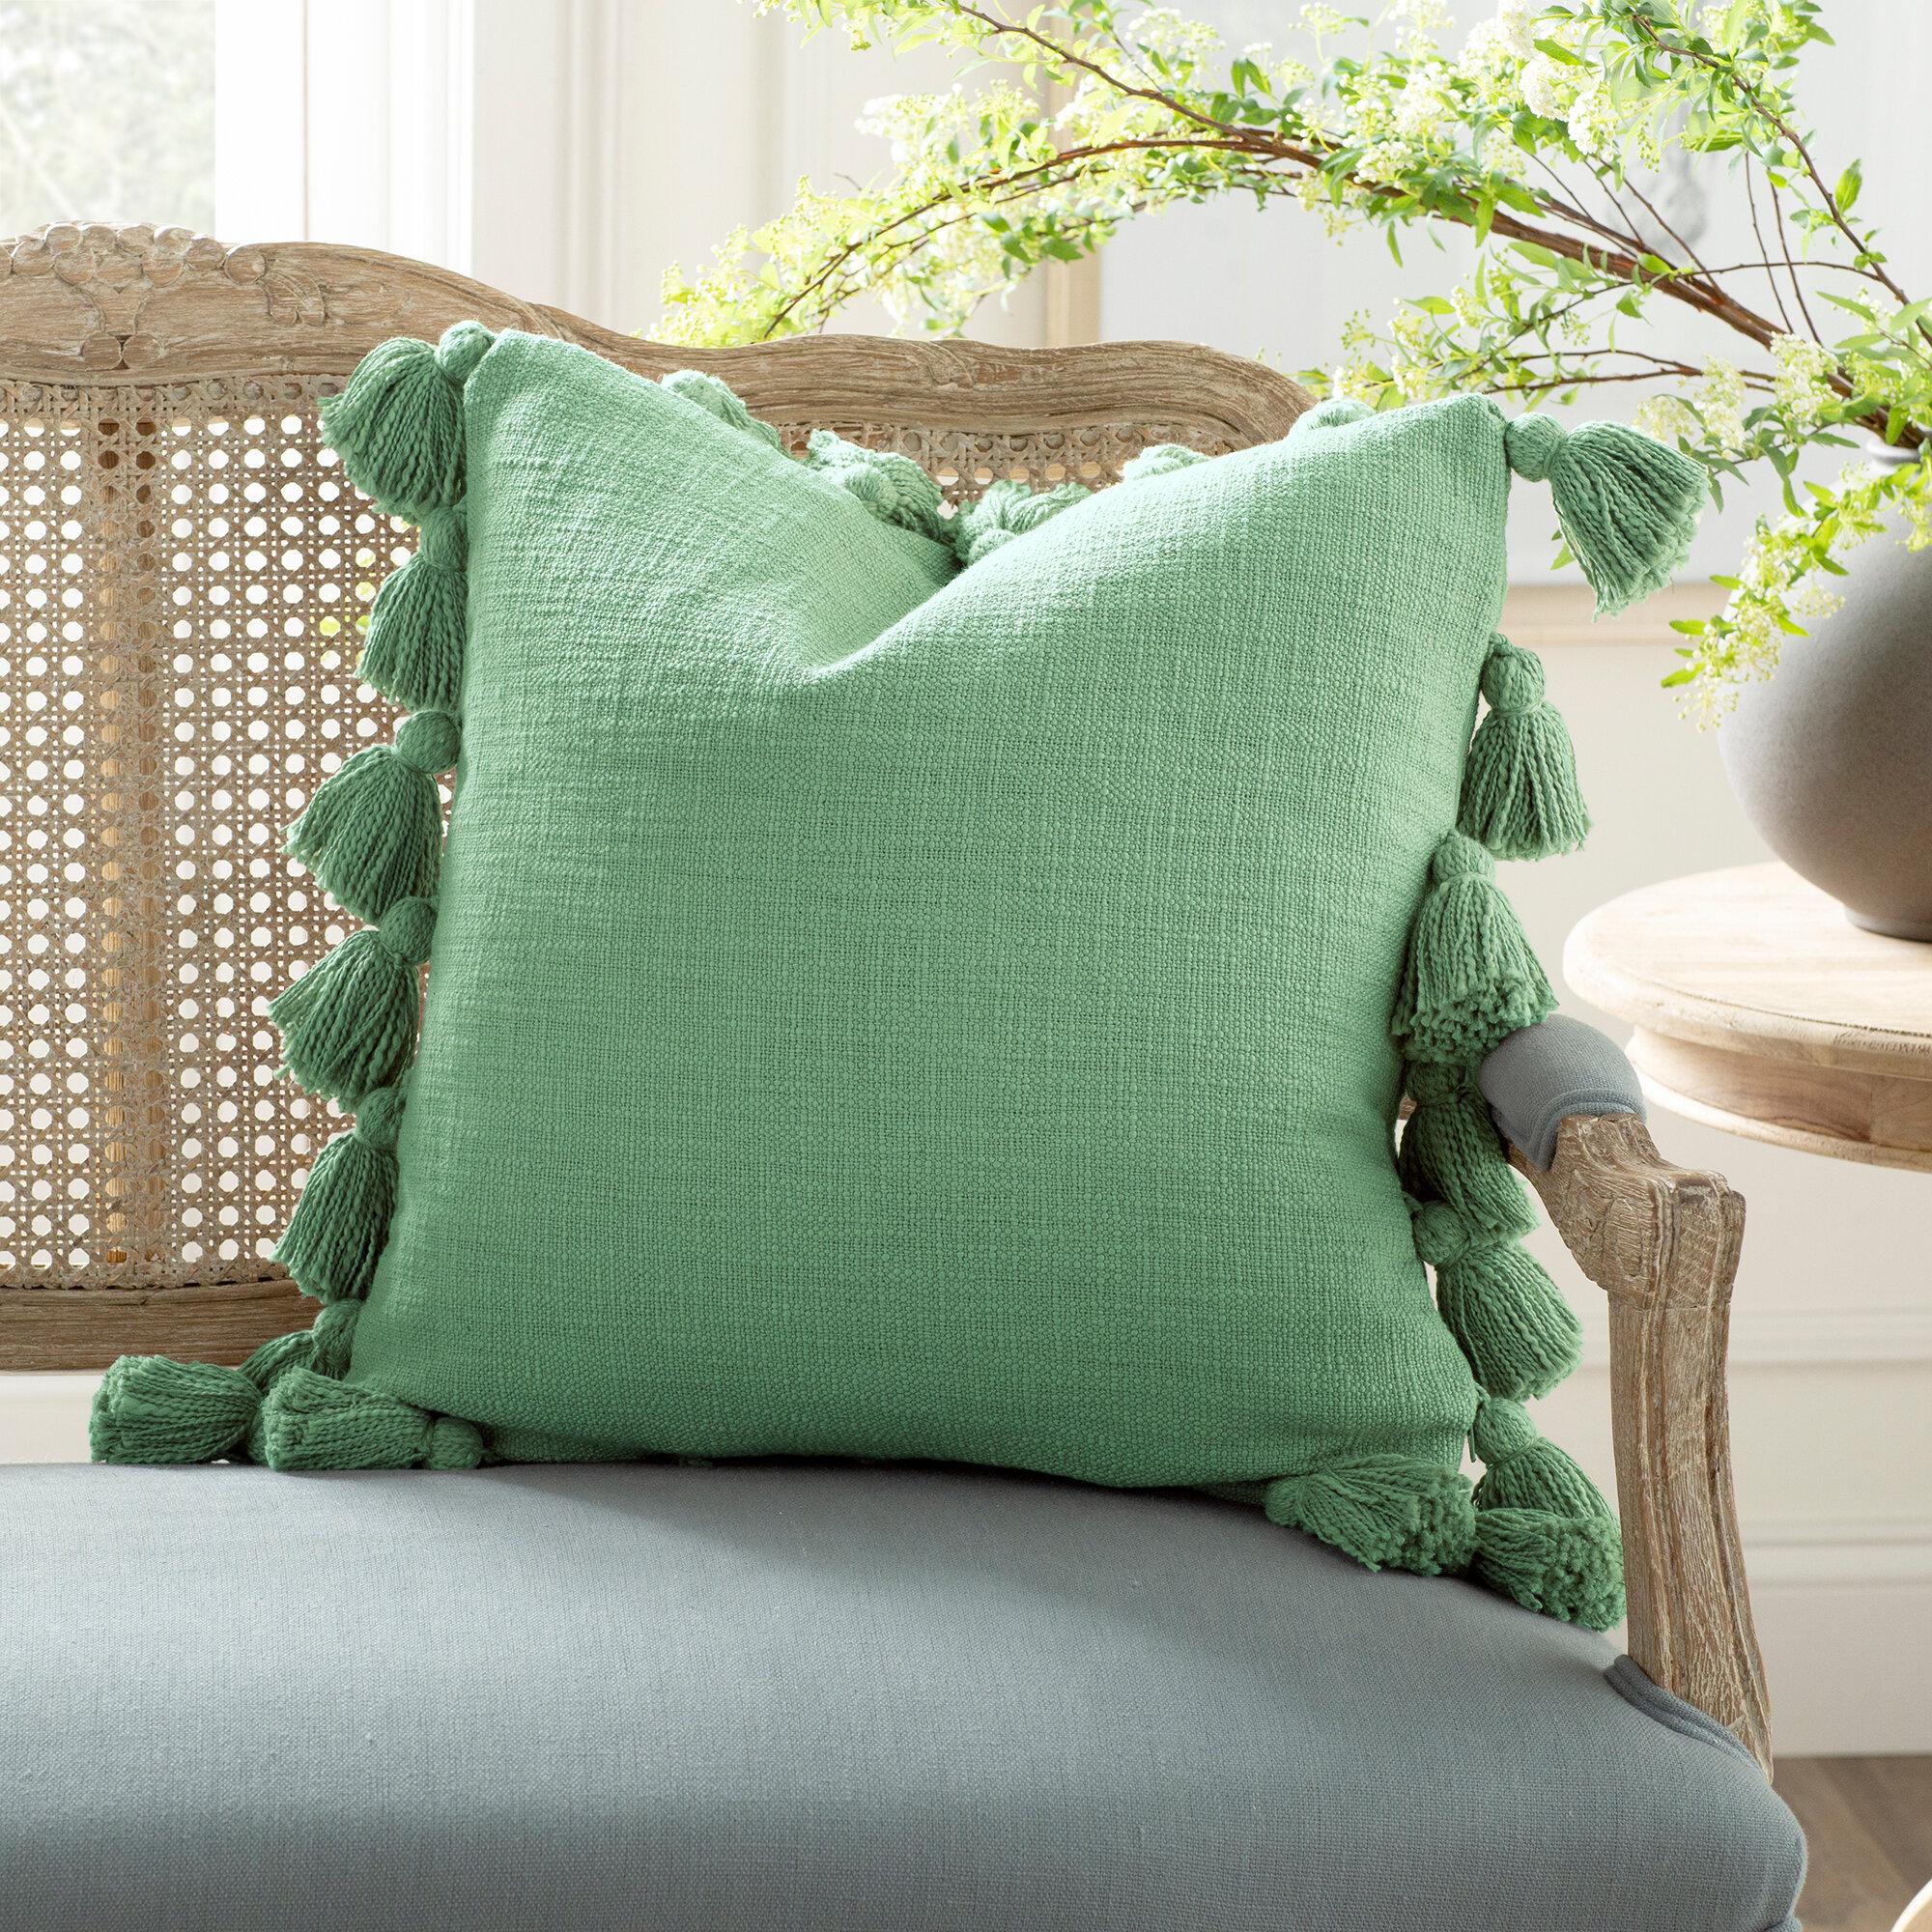 Green Orange Throw Pillows You Ll Love In 2021 Wayfair